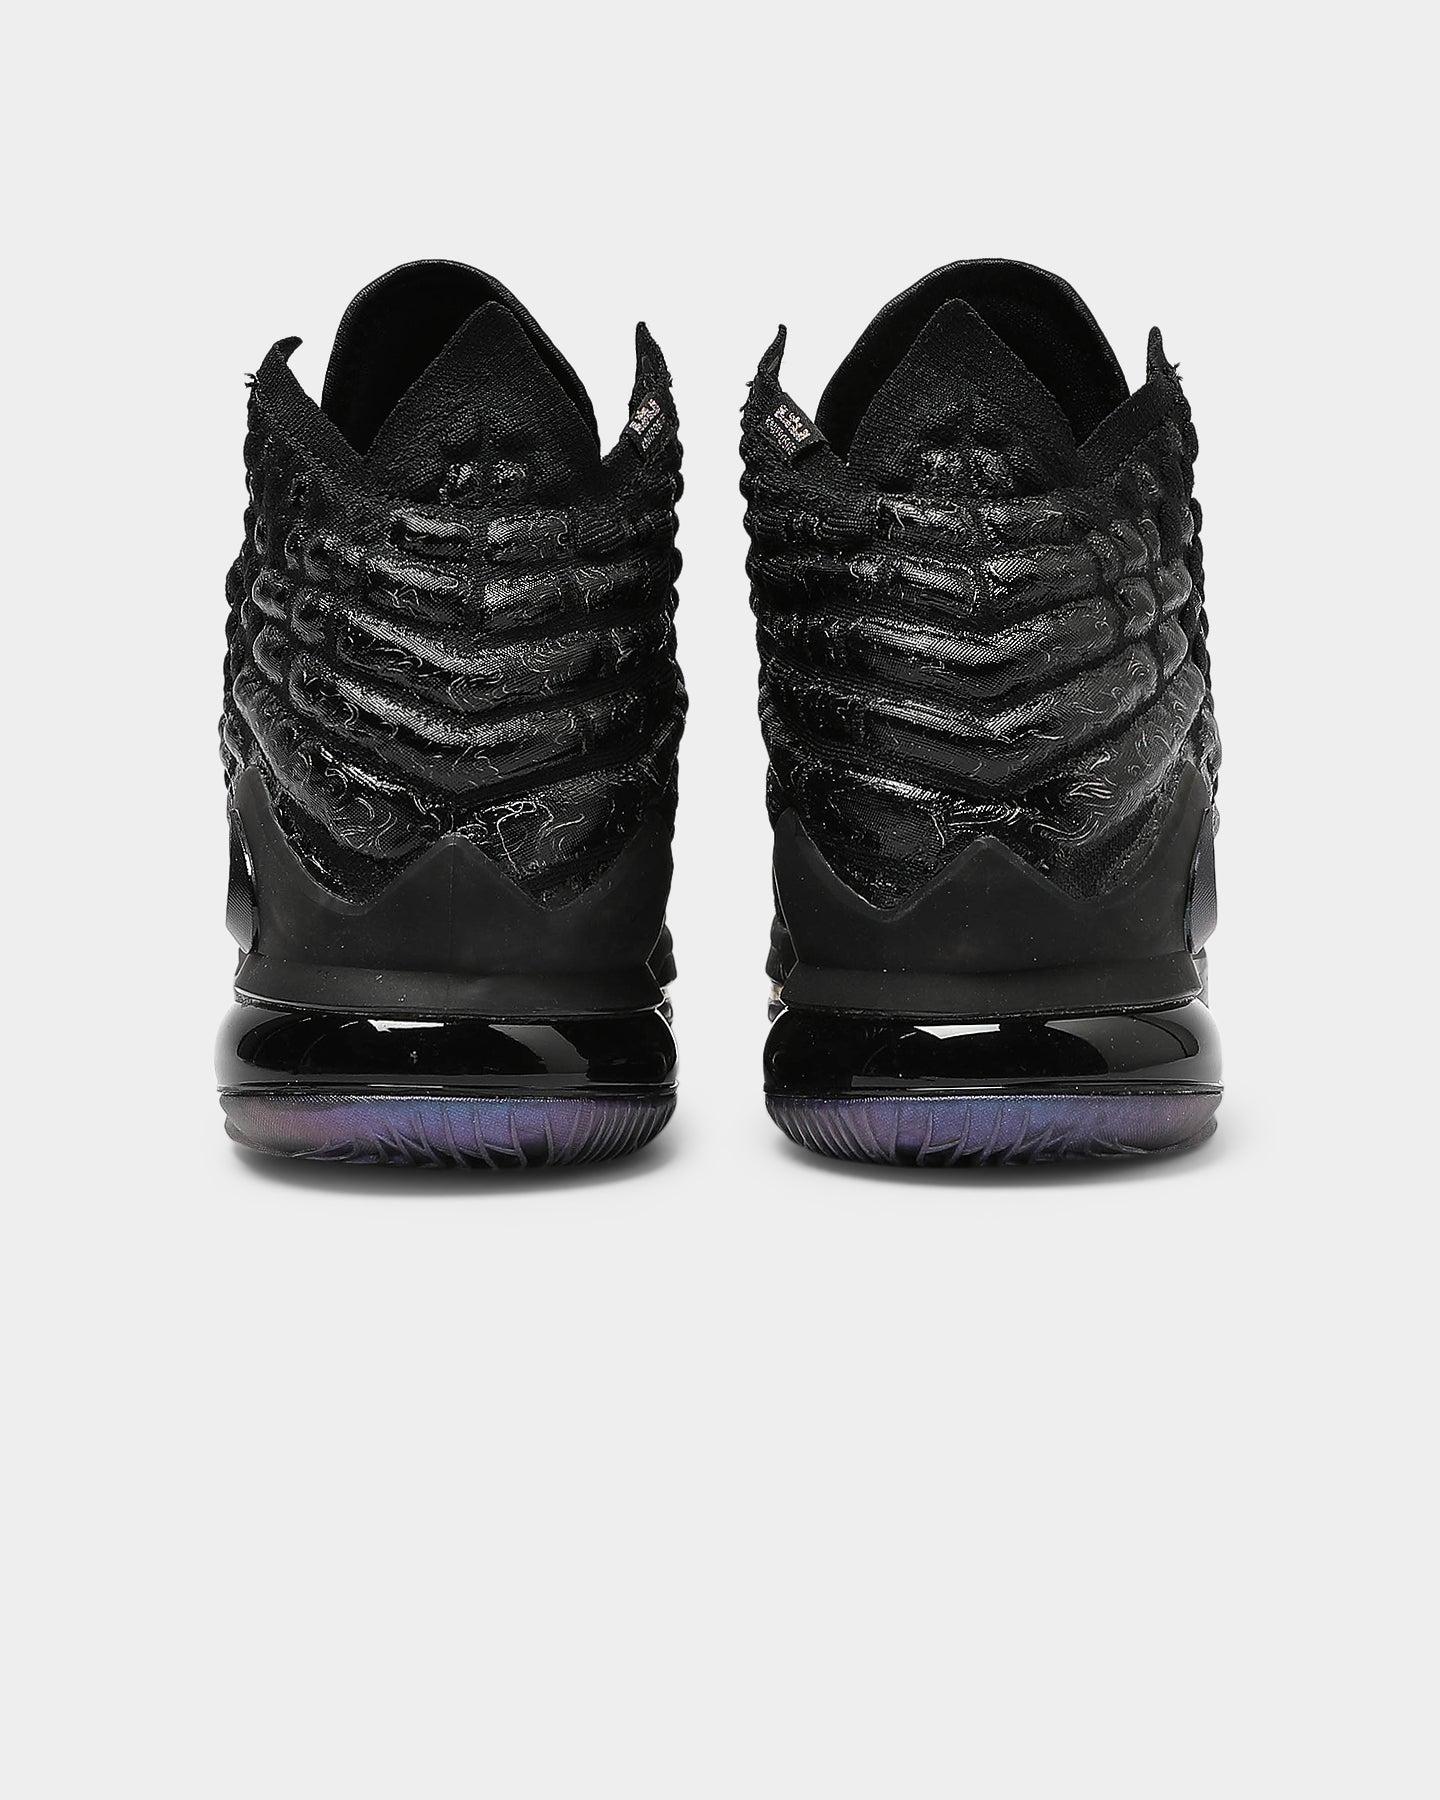 nike usa hoodie navy, Nike lebron 10 x red black shoes,nike